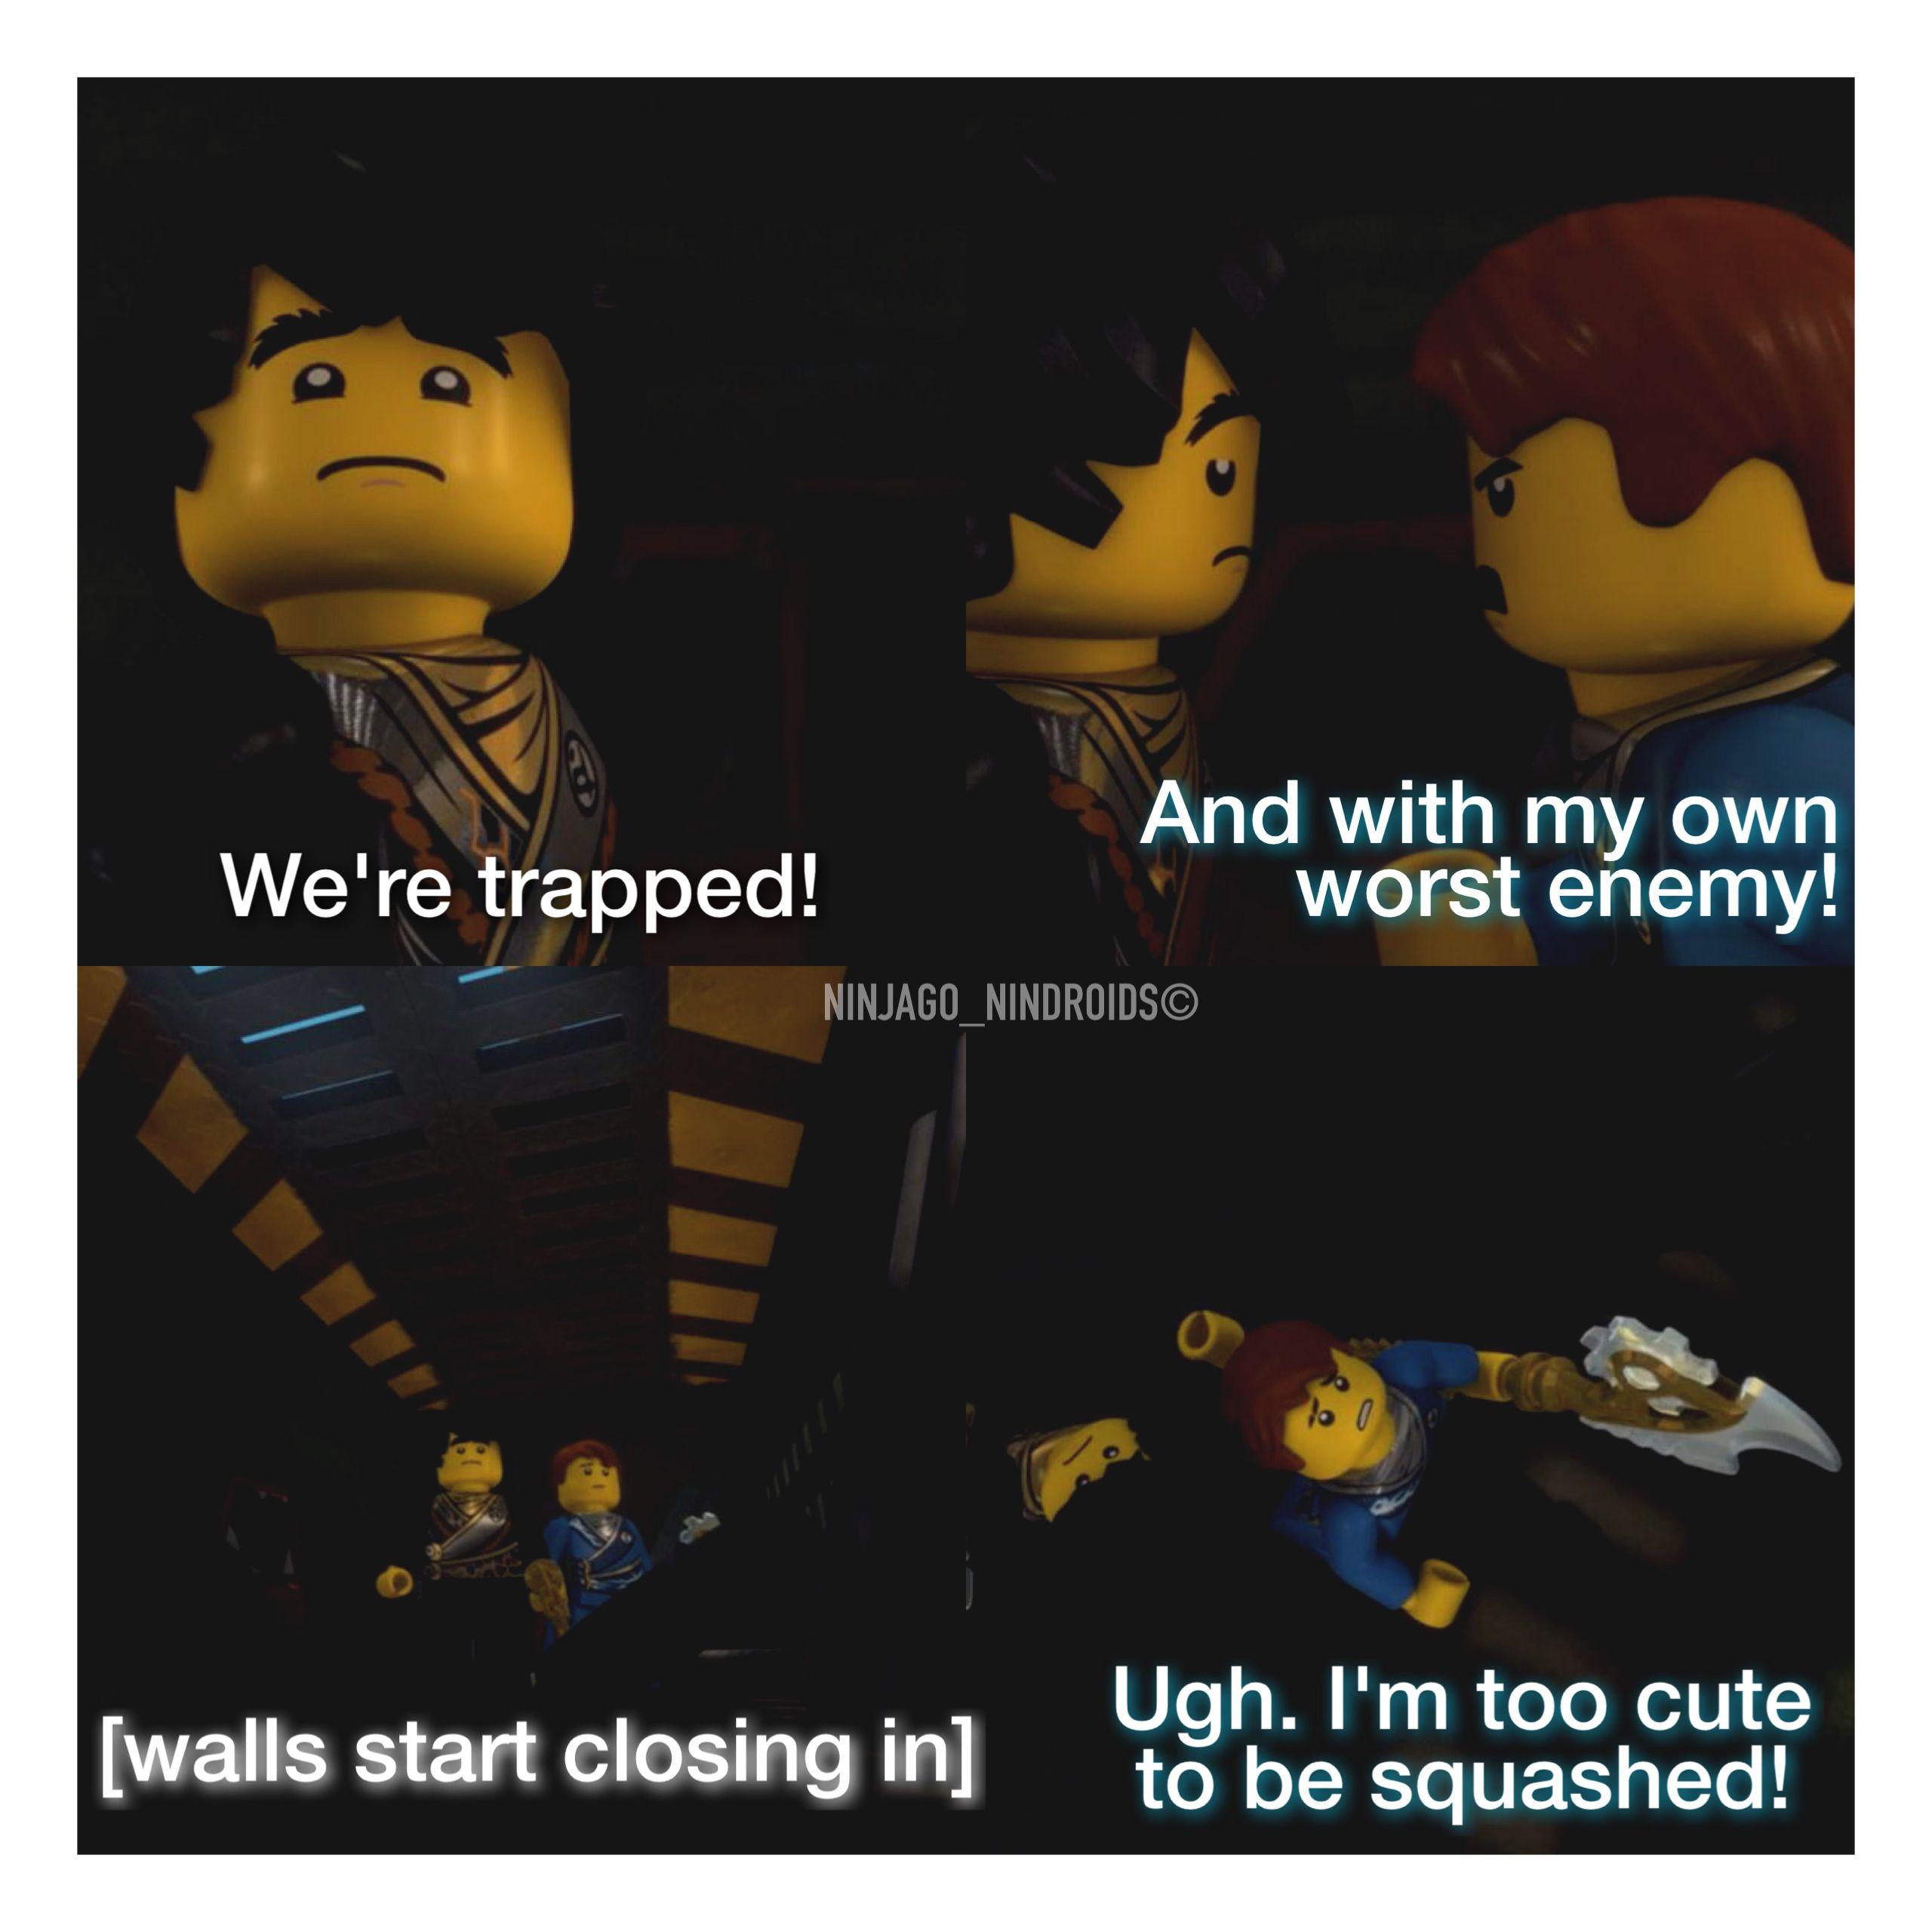 Pin By Meaghan Bailey On Ninjago Theme Ninjago Memes Lego Ninjago Lego Ninjago Movie